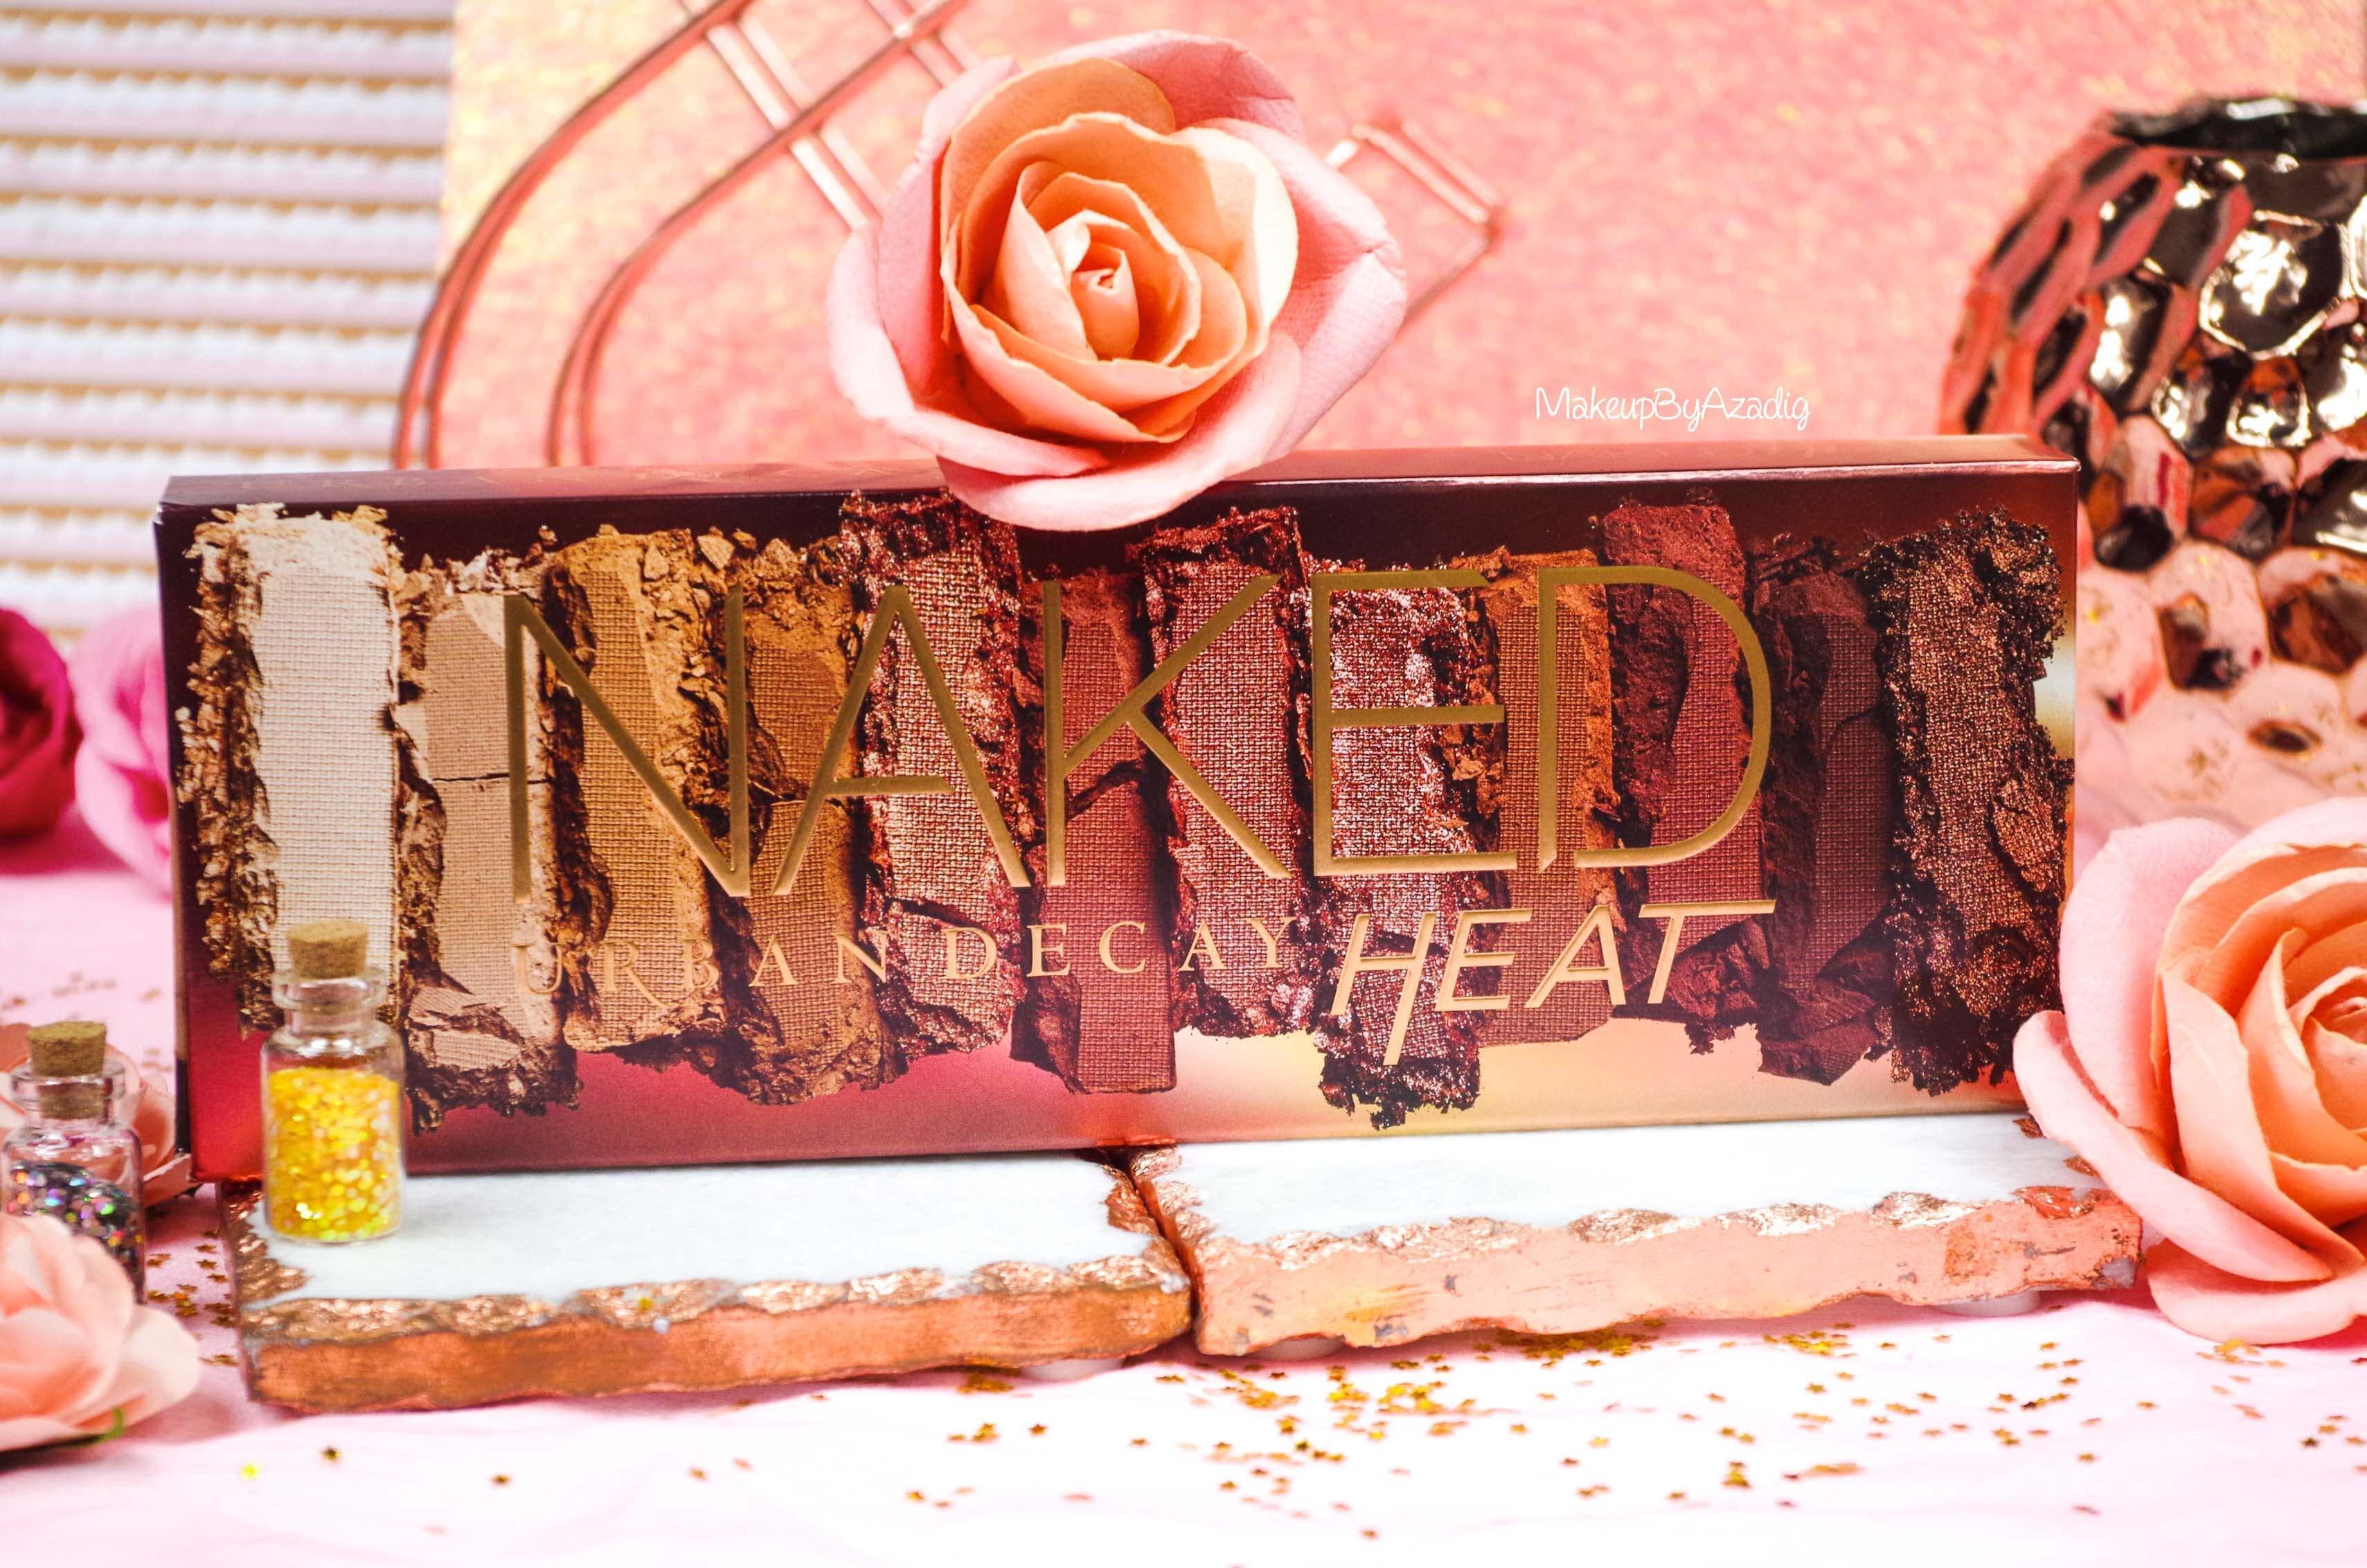 revue-review-nouvelle-palette-naked-heat-urban-decay-sephora-avis-prix-france-makeupbyazadig-swatch-perfect